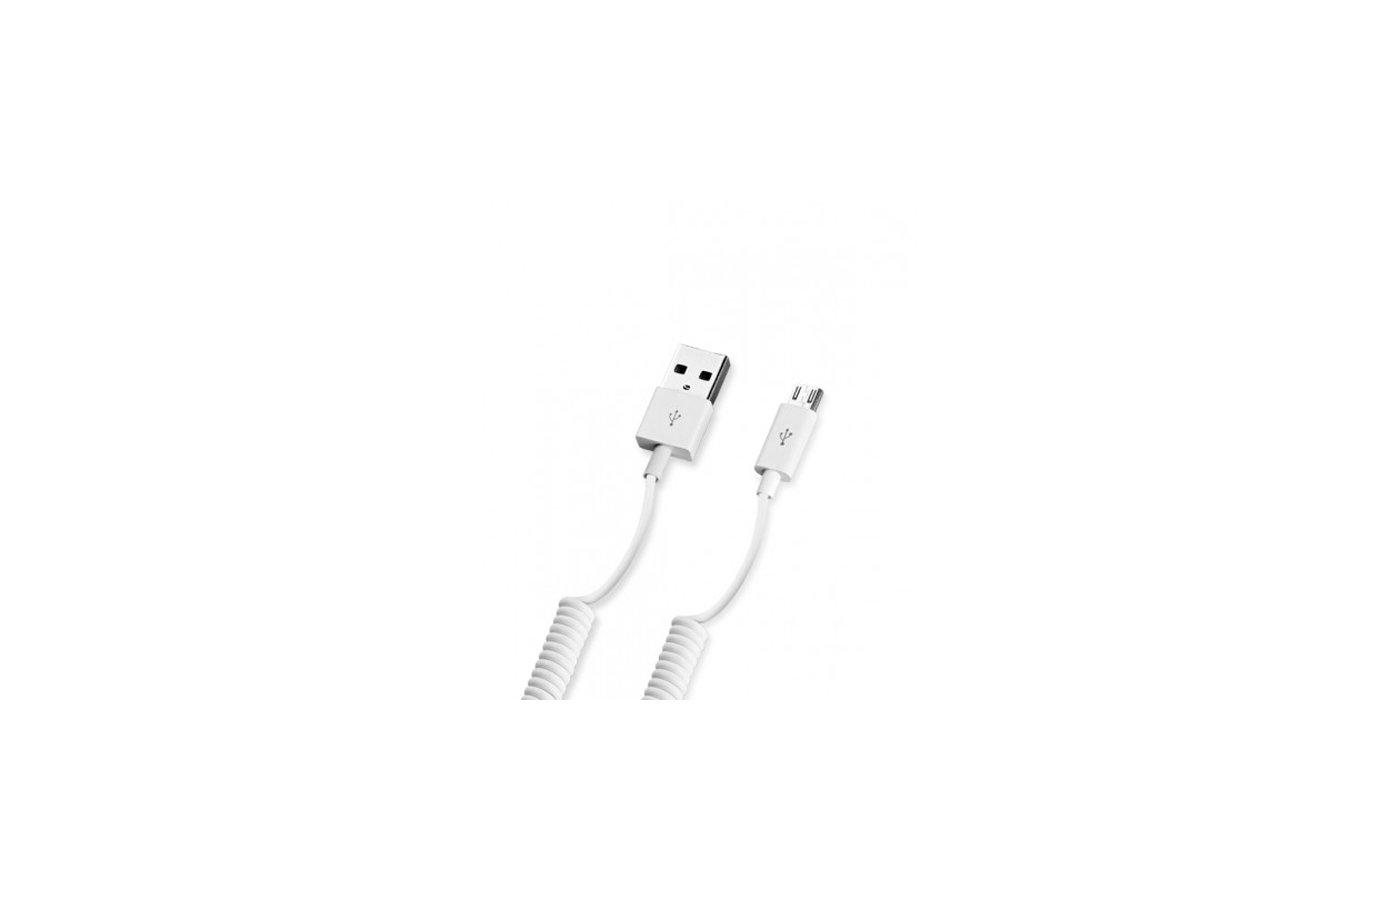 Кабель Deppa microUSB витой 1.5м. белый  (72122)